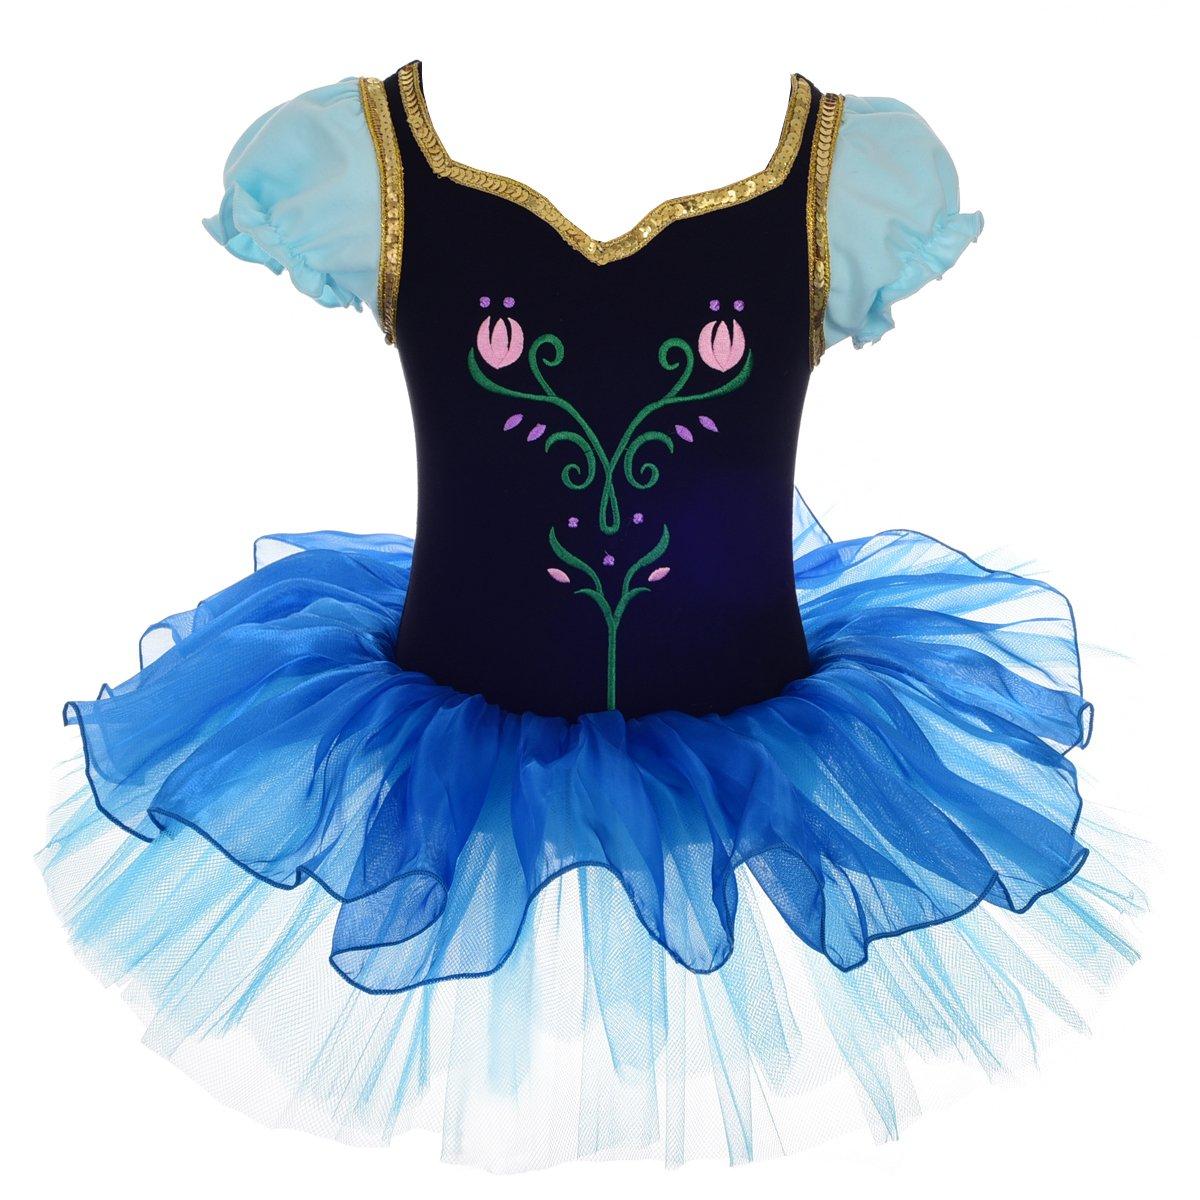 ad78576cc02b Amazon.com  Dressy Daisy Girls  Princess Anna Tulip Ballet Tutus ...